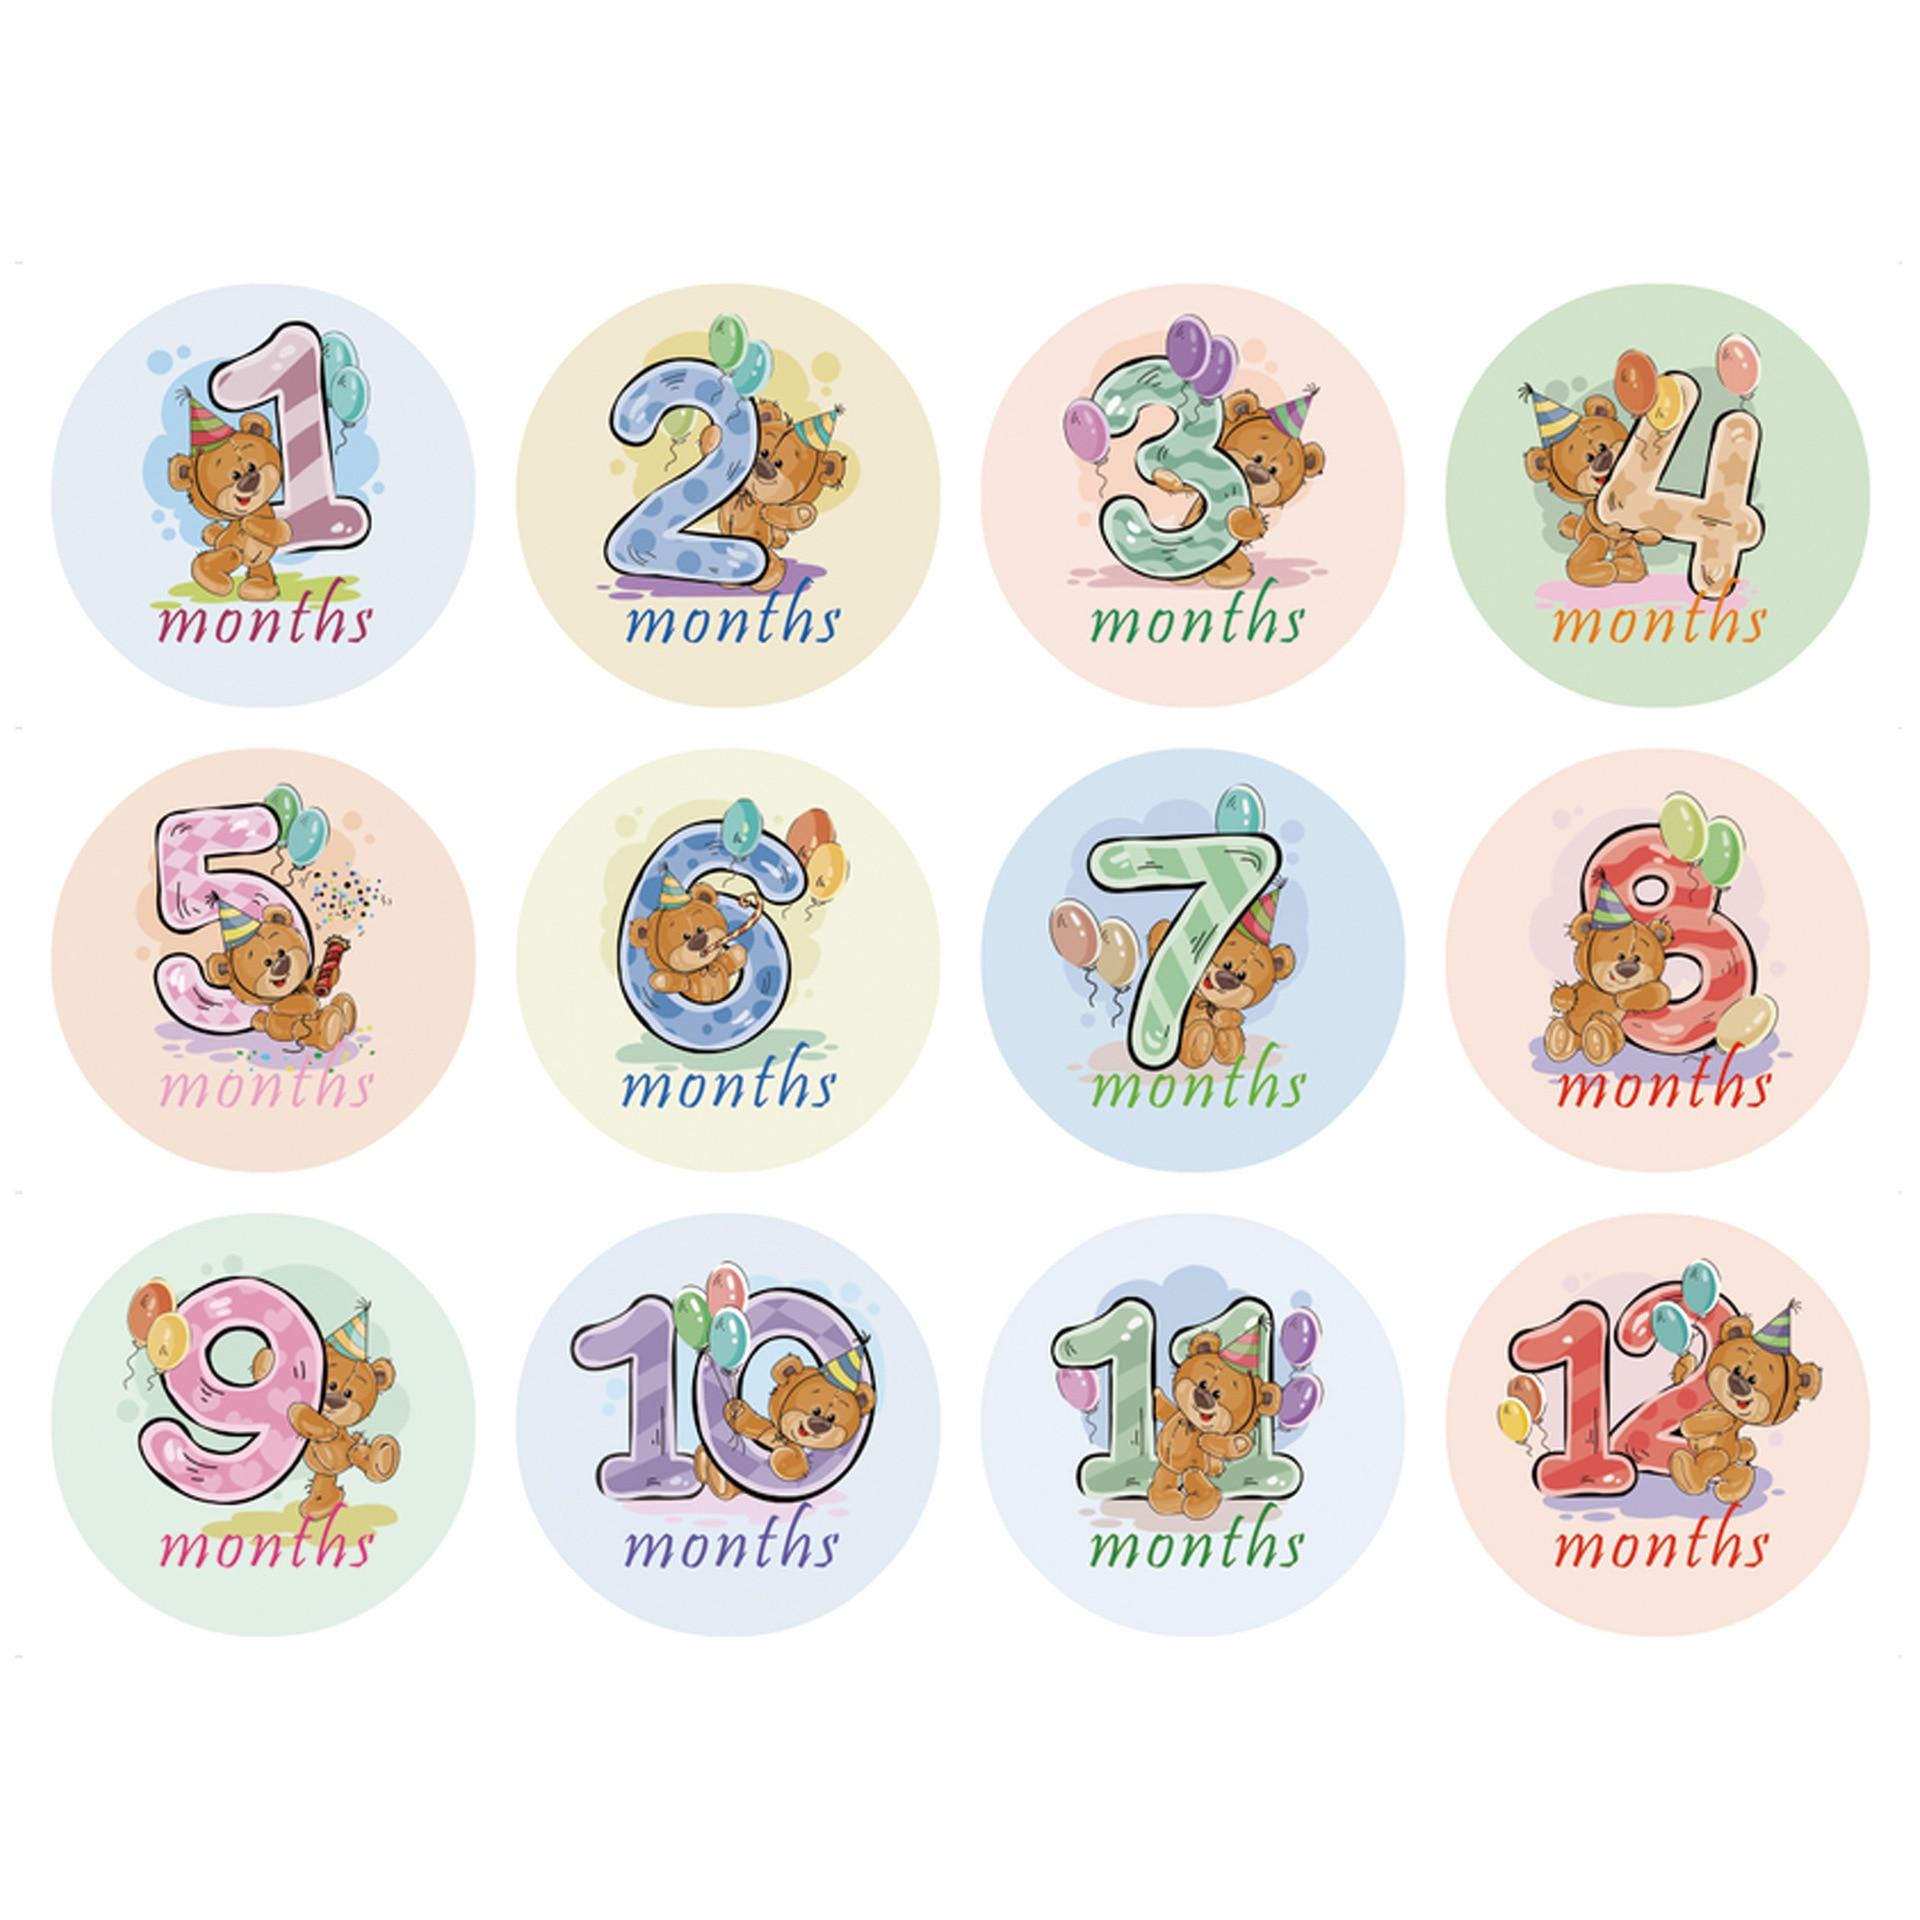 12Pcs Month Sticker Milestone Cards Baby Gift Set Baby Age Cards - Baby Milestone Cards, Baby Photo Cards - Newborn Photo